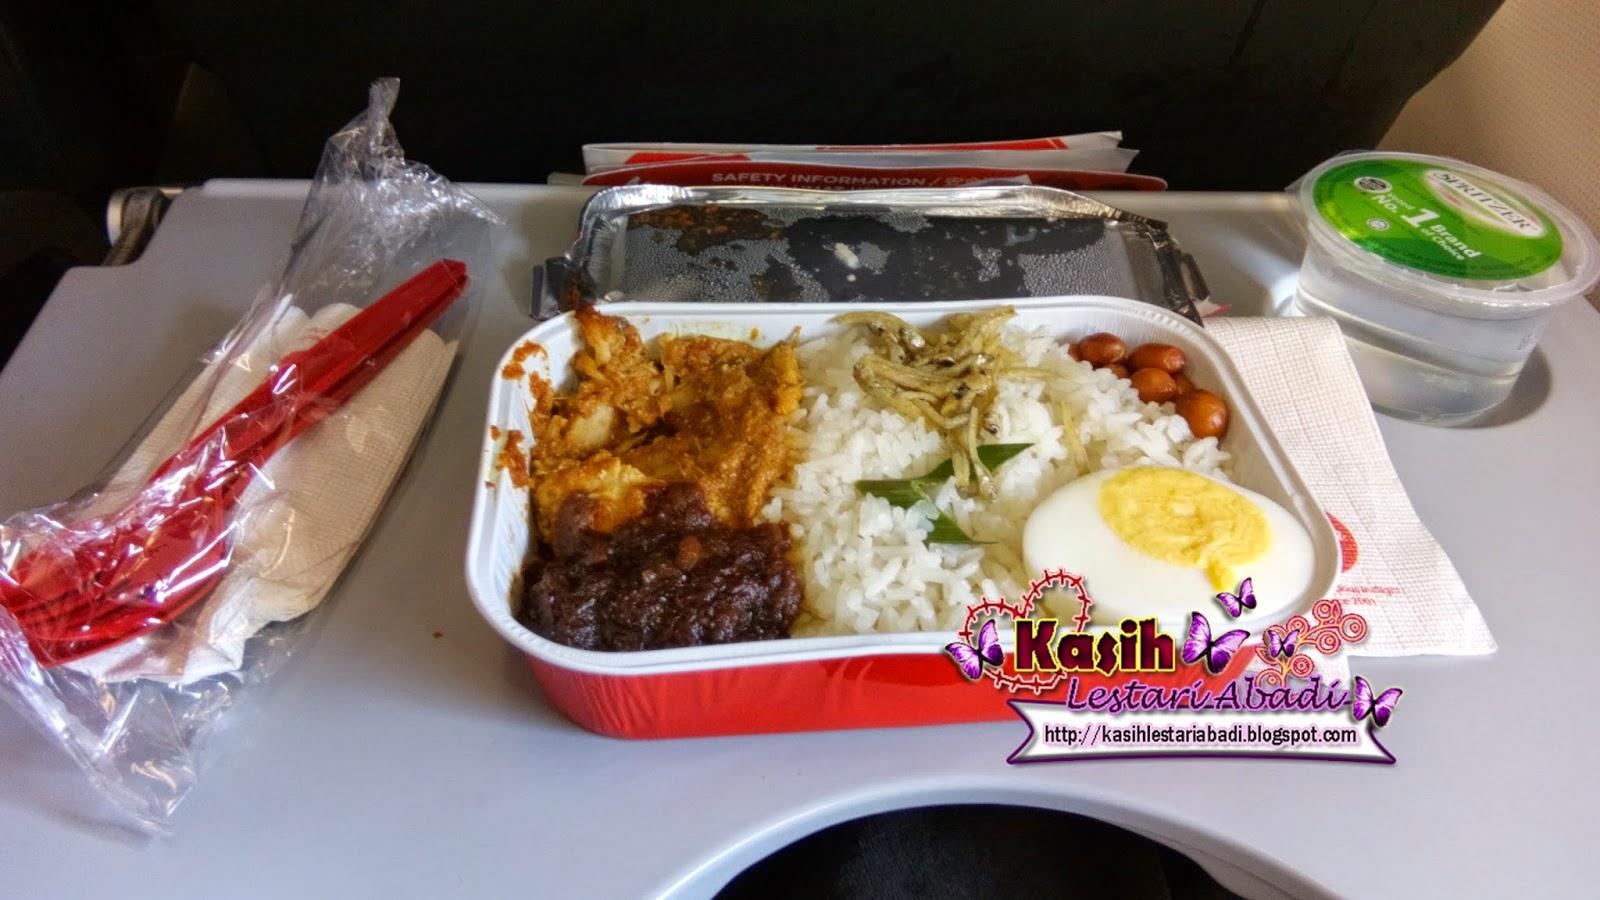 Ho Chi Minh,Airasia,Nasi Lemak